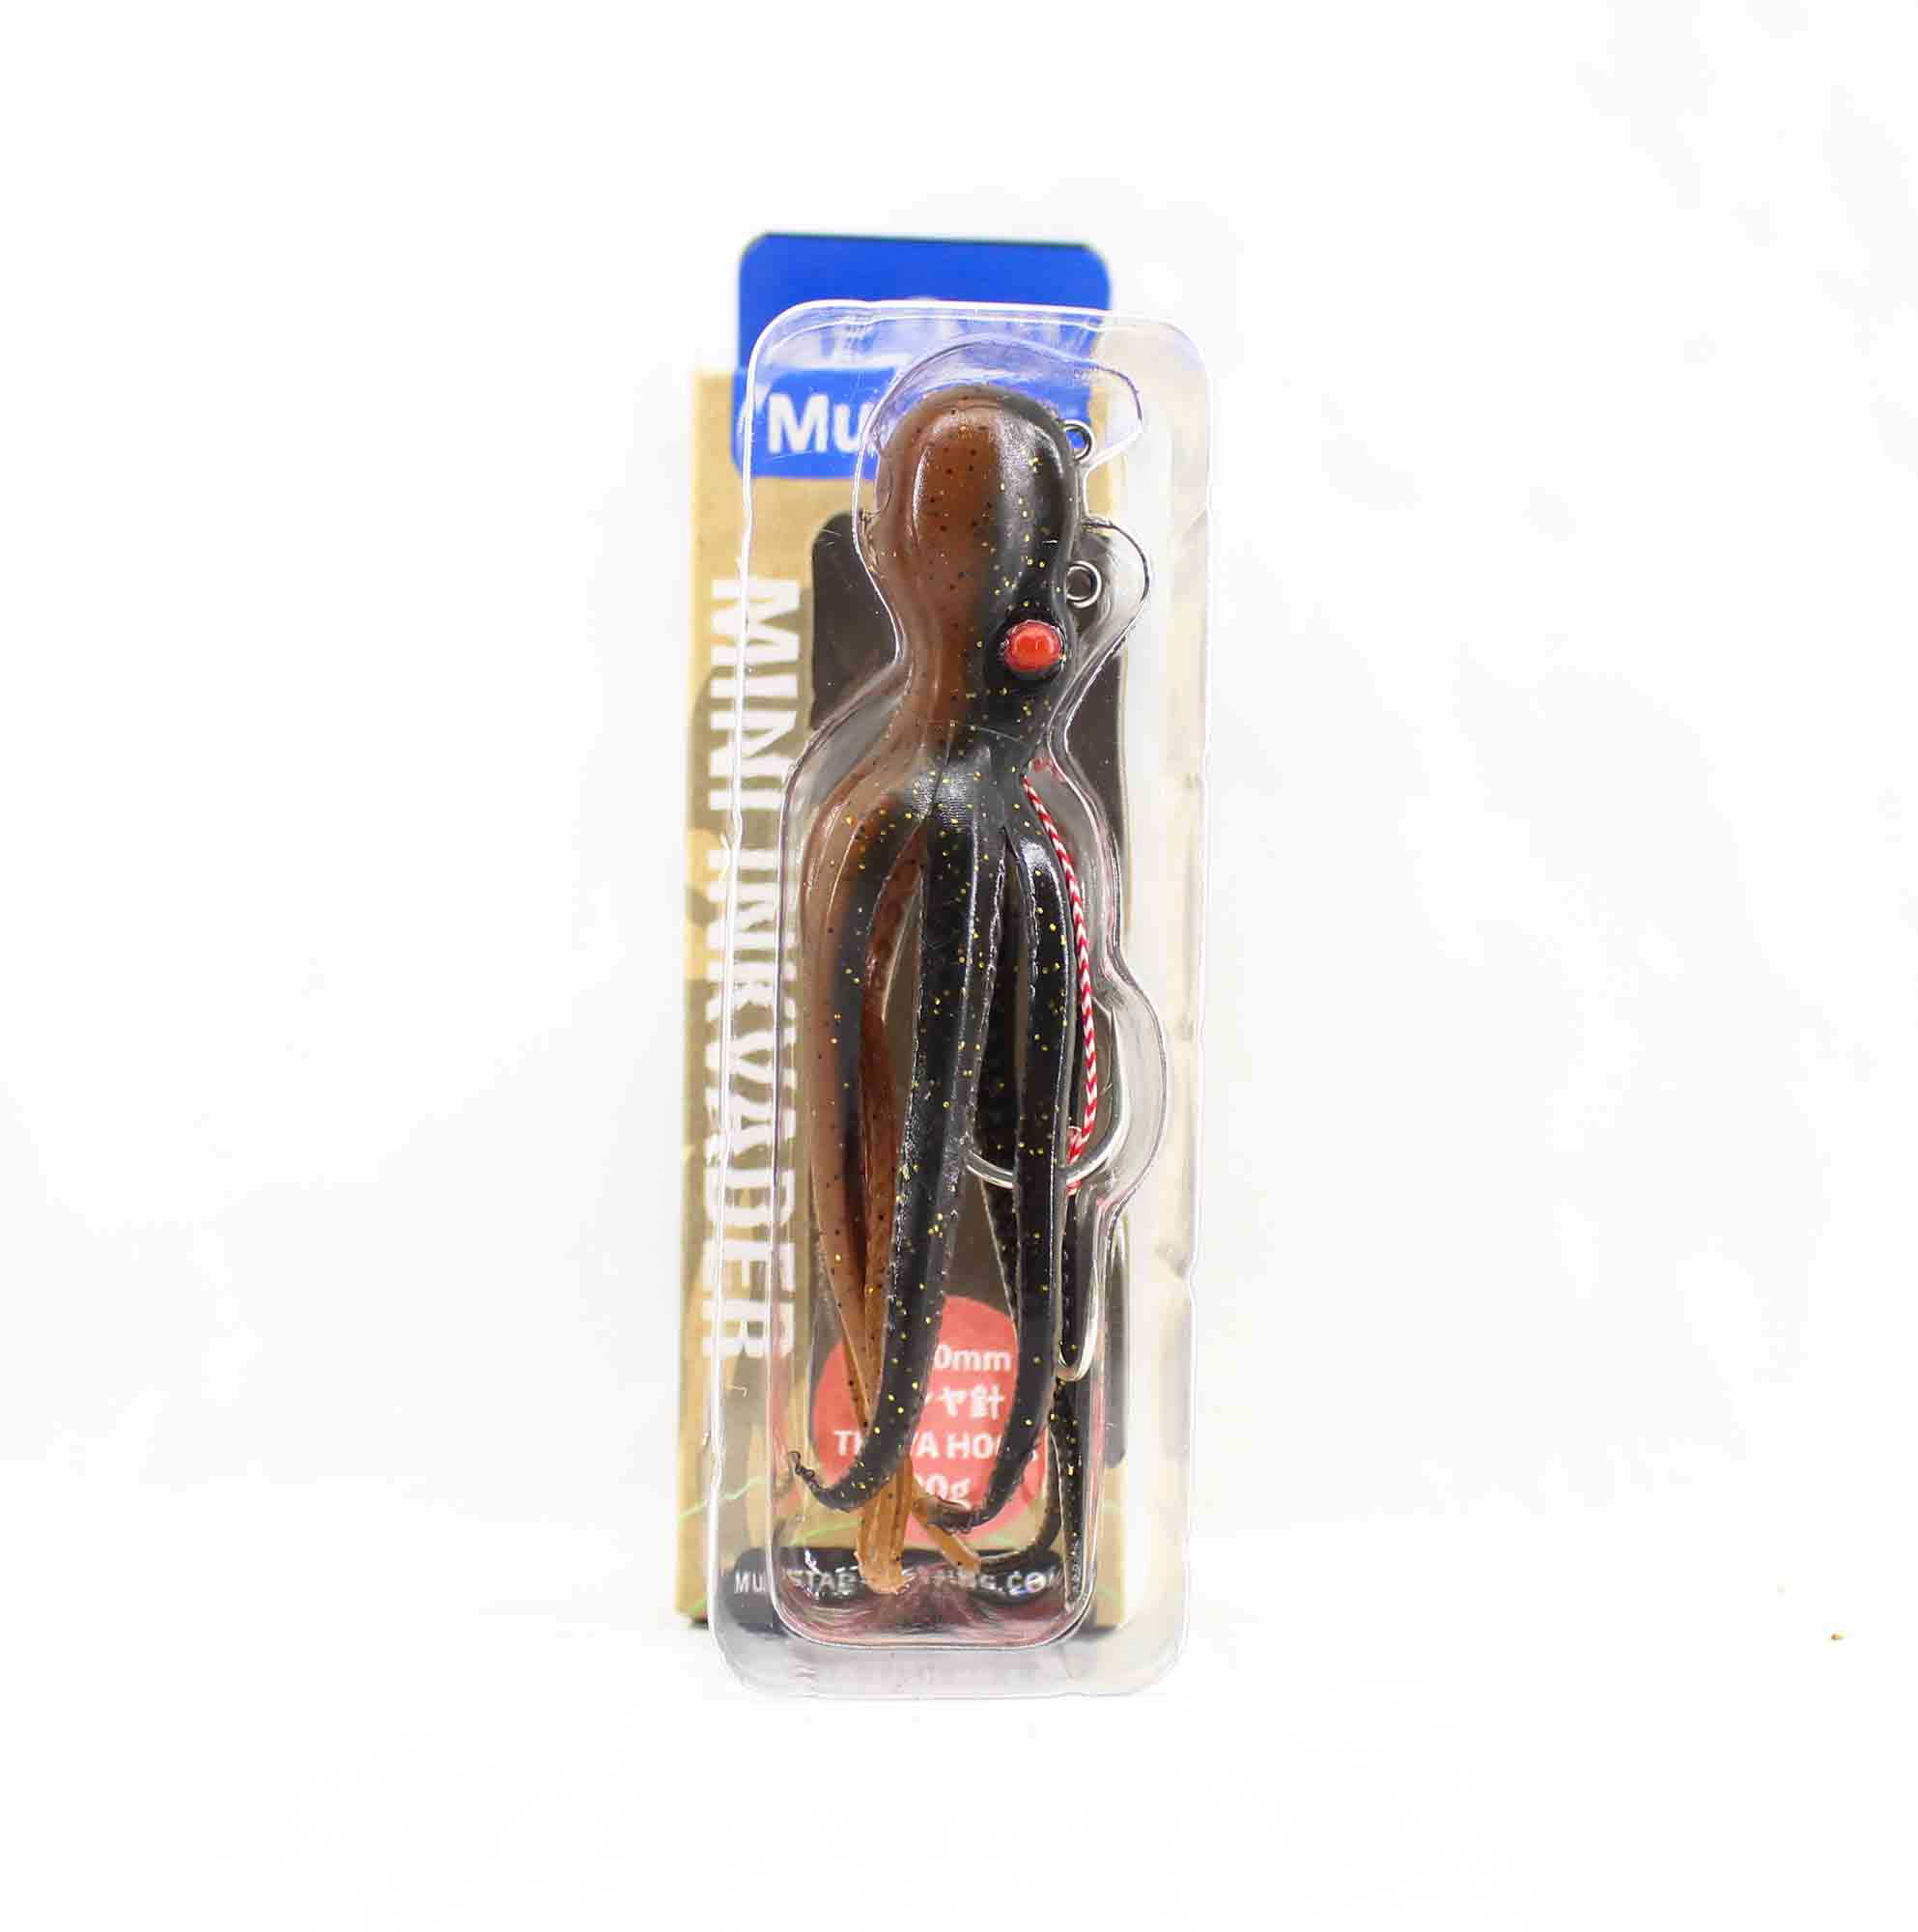 Mustad MIKVT-MINI-DBD-20-1 Ink Vader Mini Tenya 20 grams (8528)